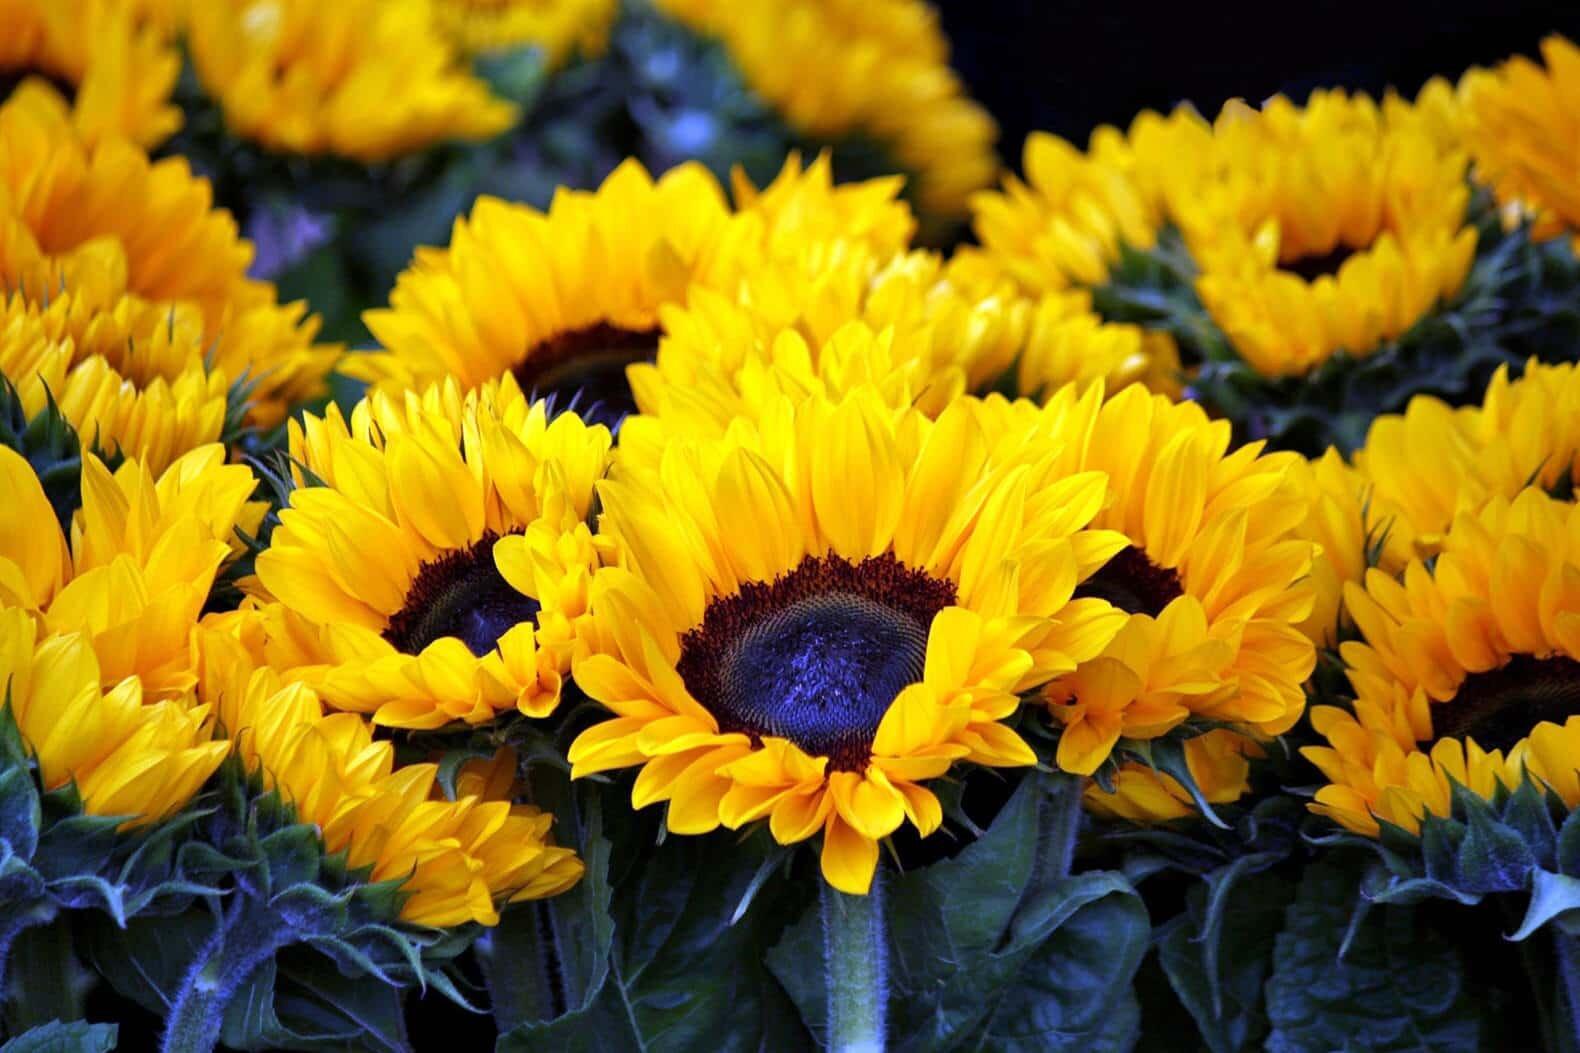 yellow budding sunflowers